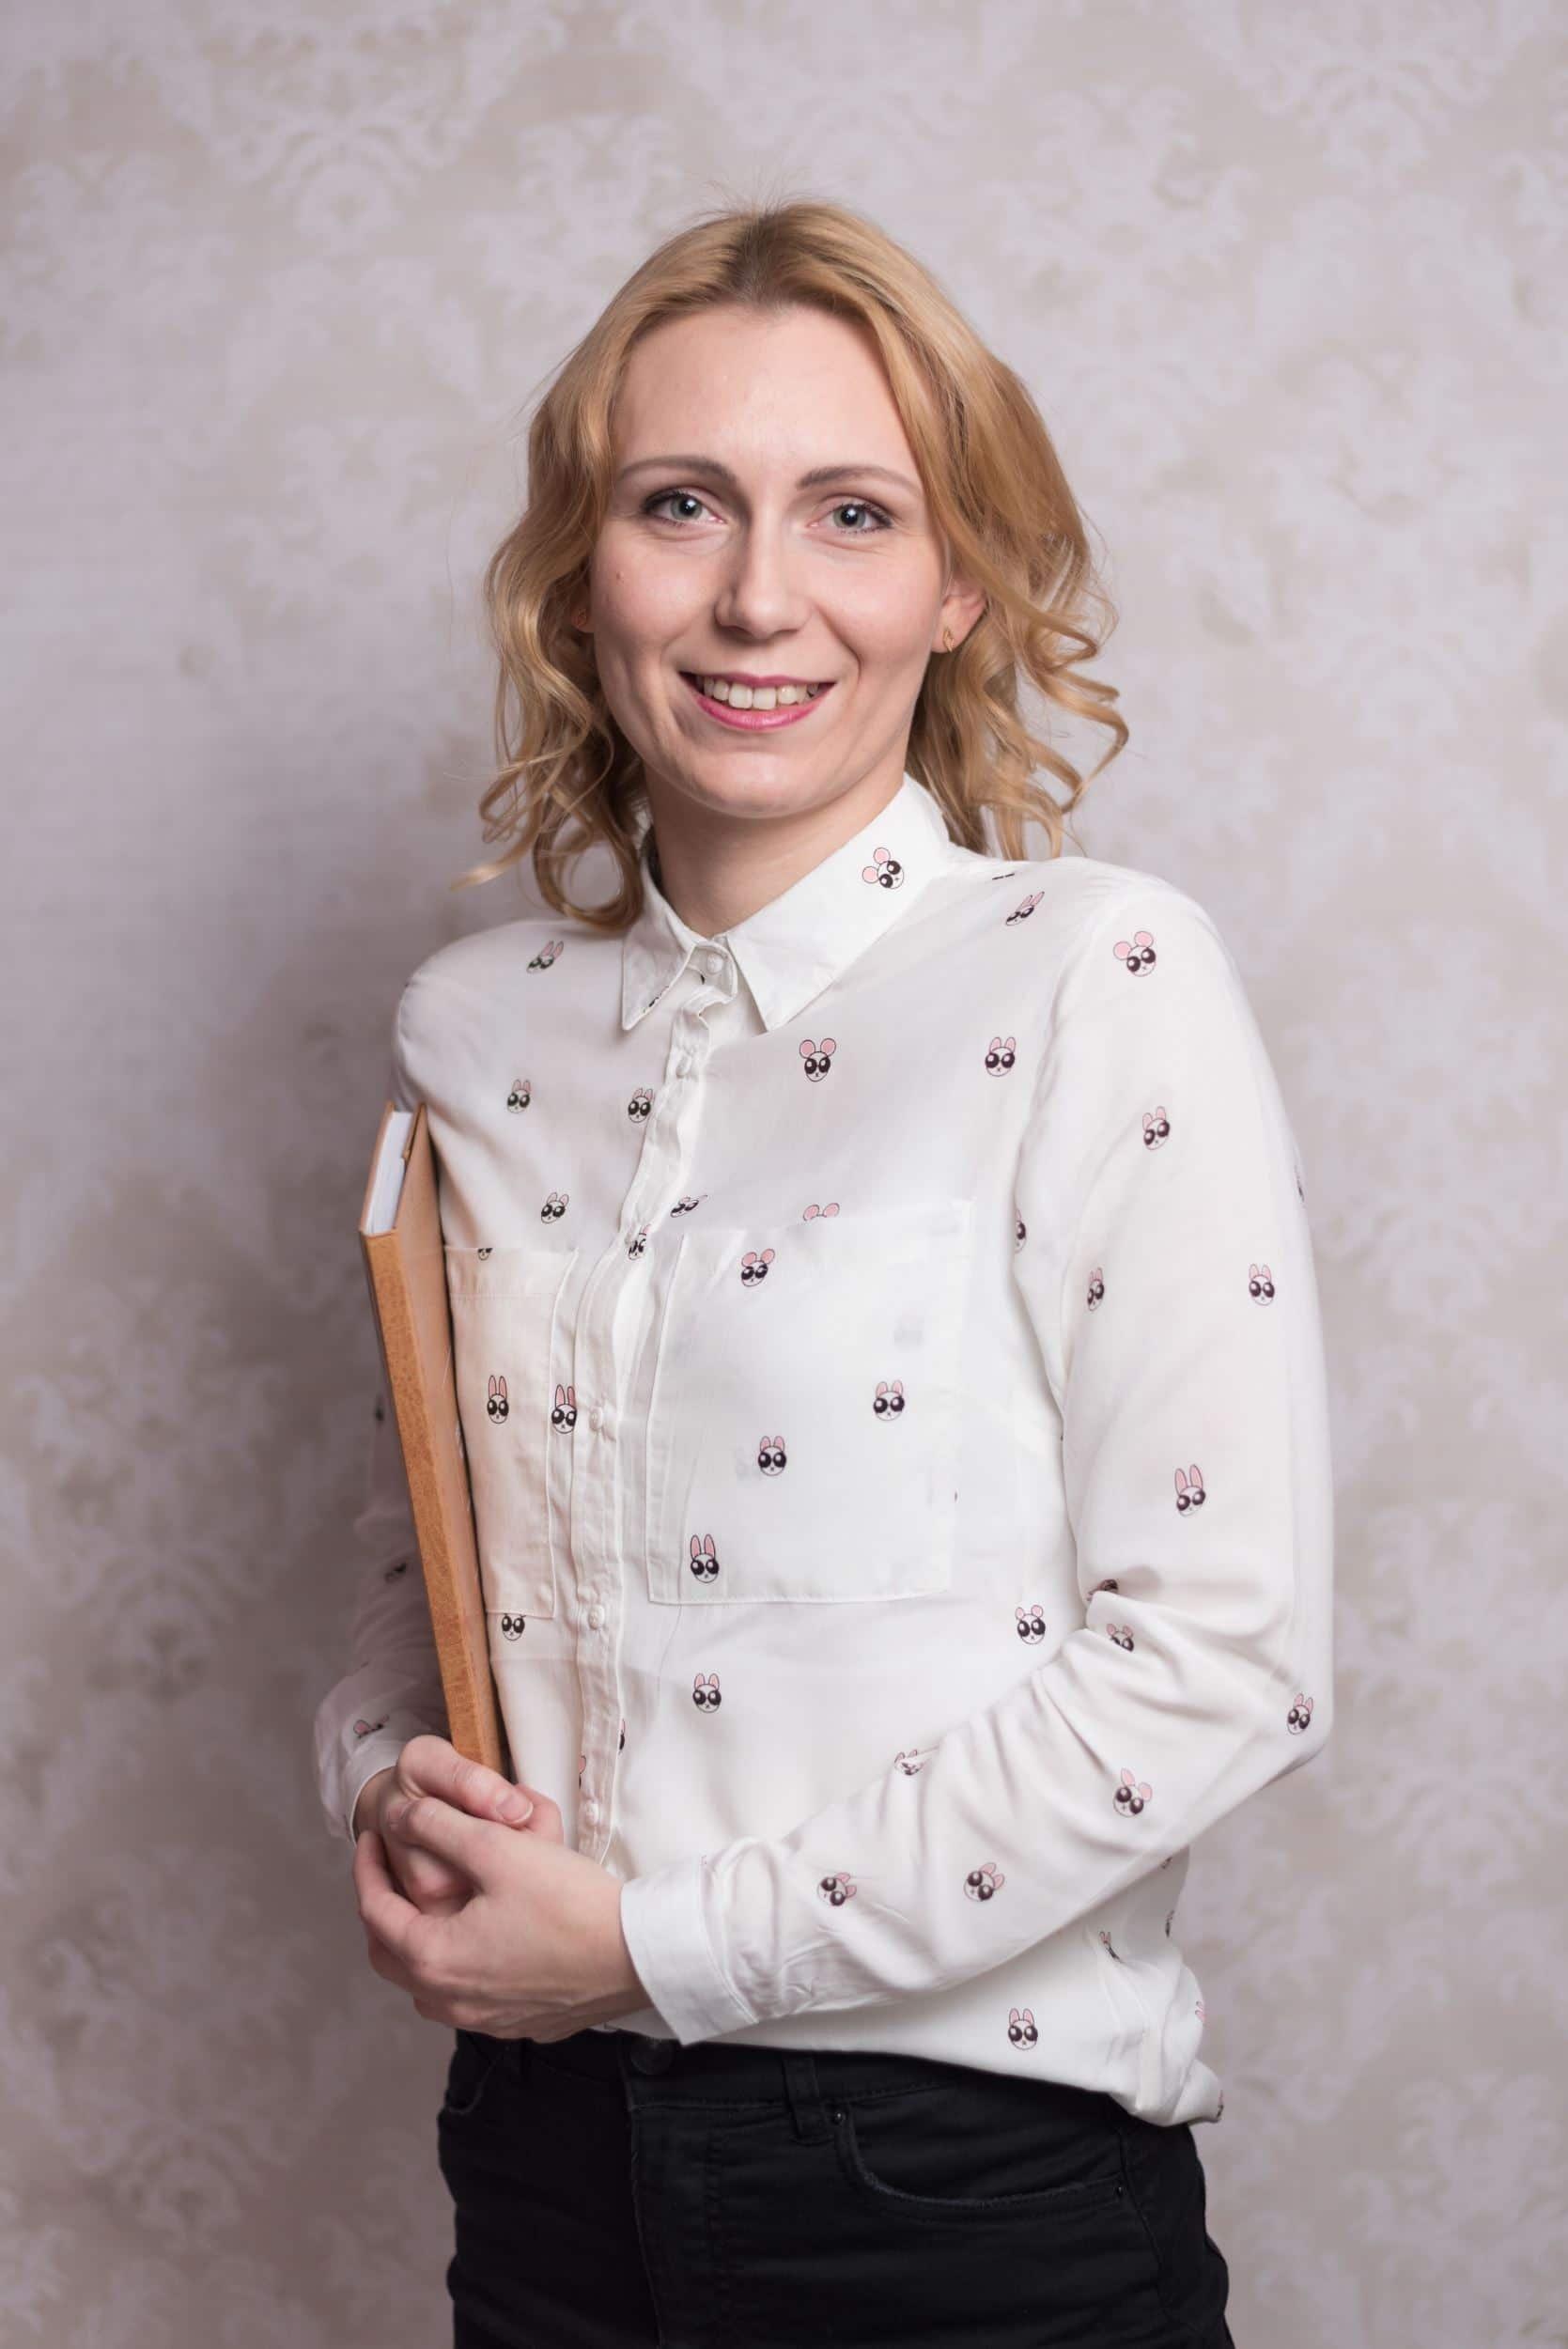 Joanna Dryjer